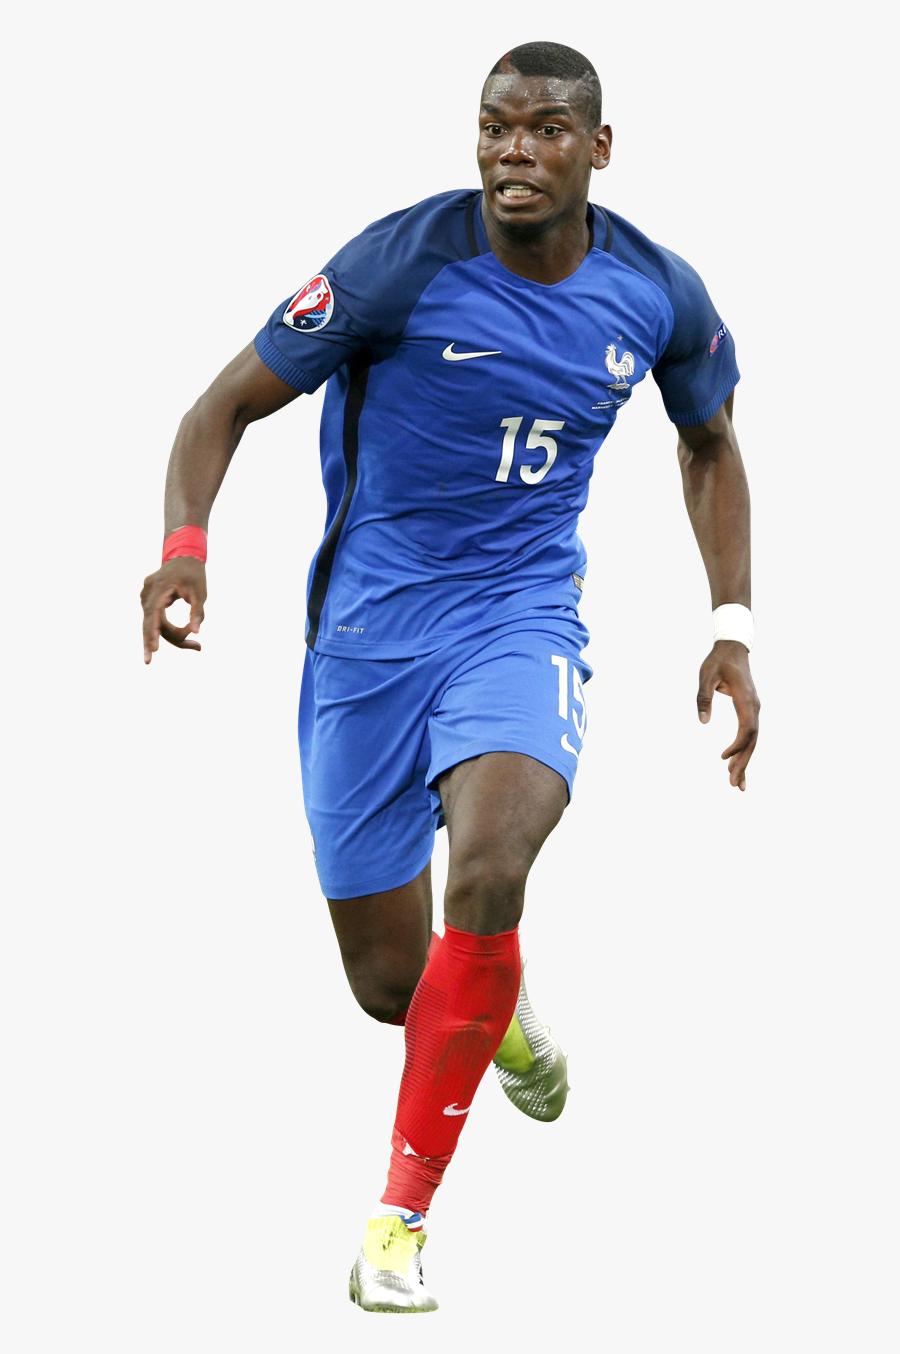 Pogba Football Team Paul Sport Jersey Clipart.